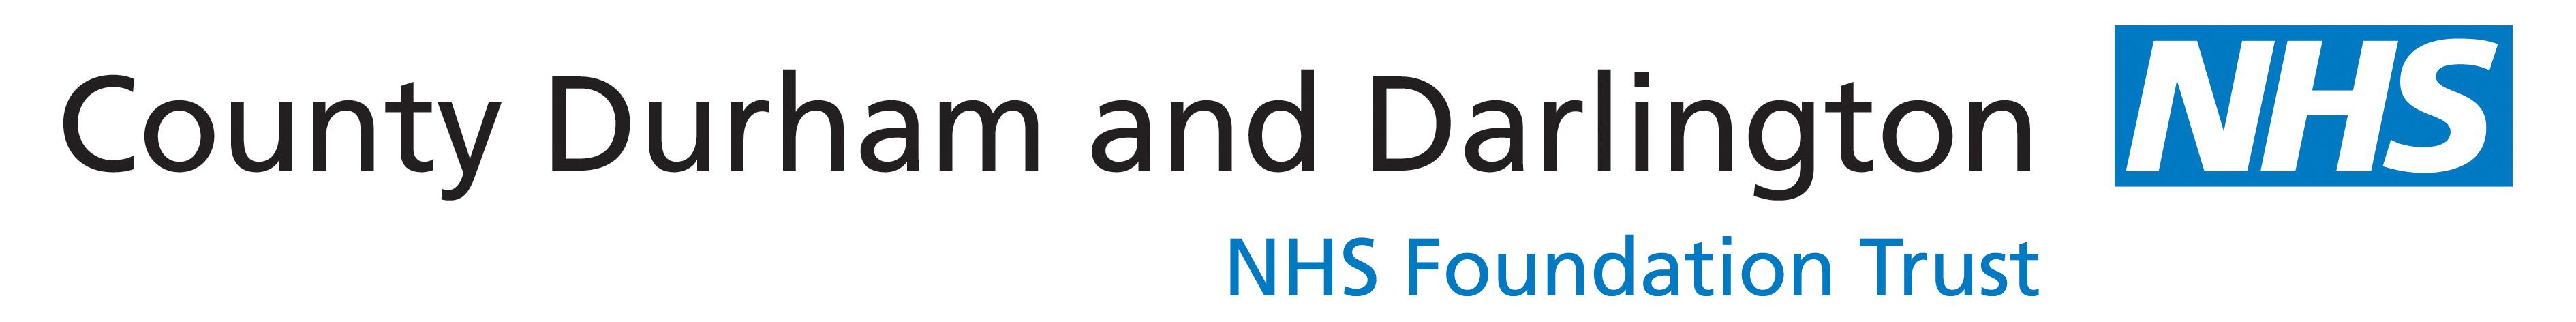 Inhealthcare customer - County Durham and Darlington